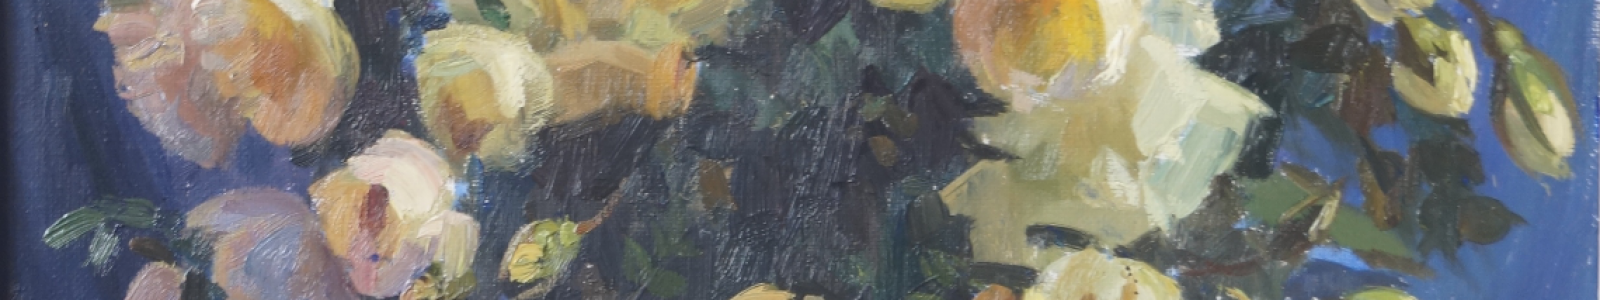 Gallery Painter Peter Yavich